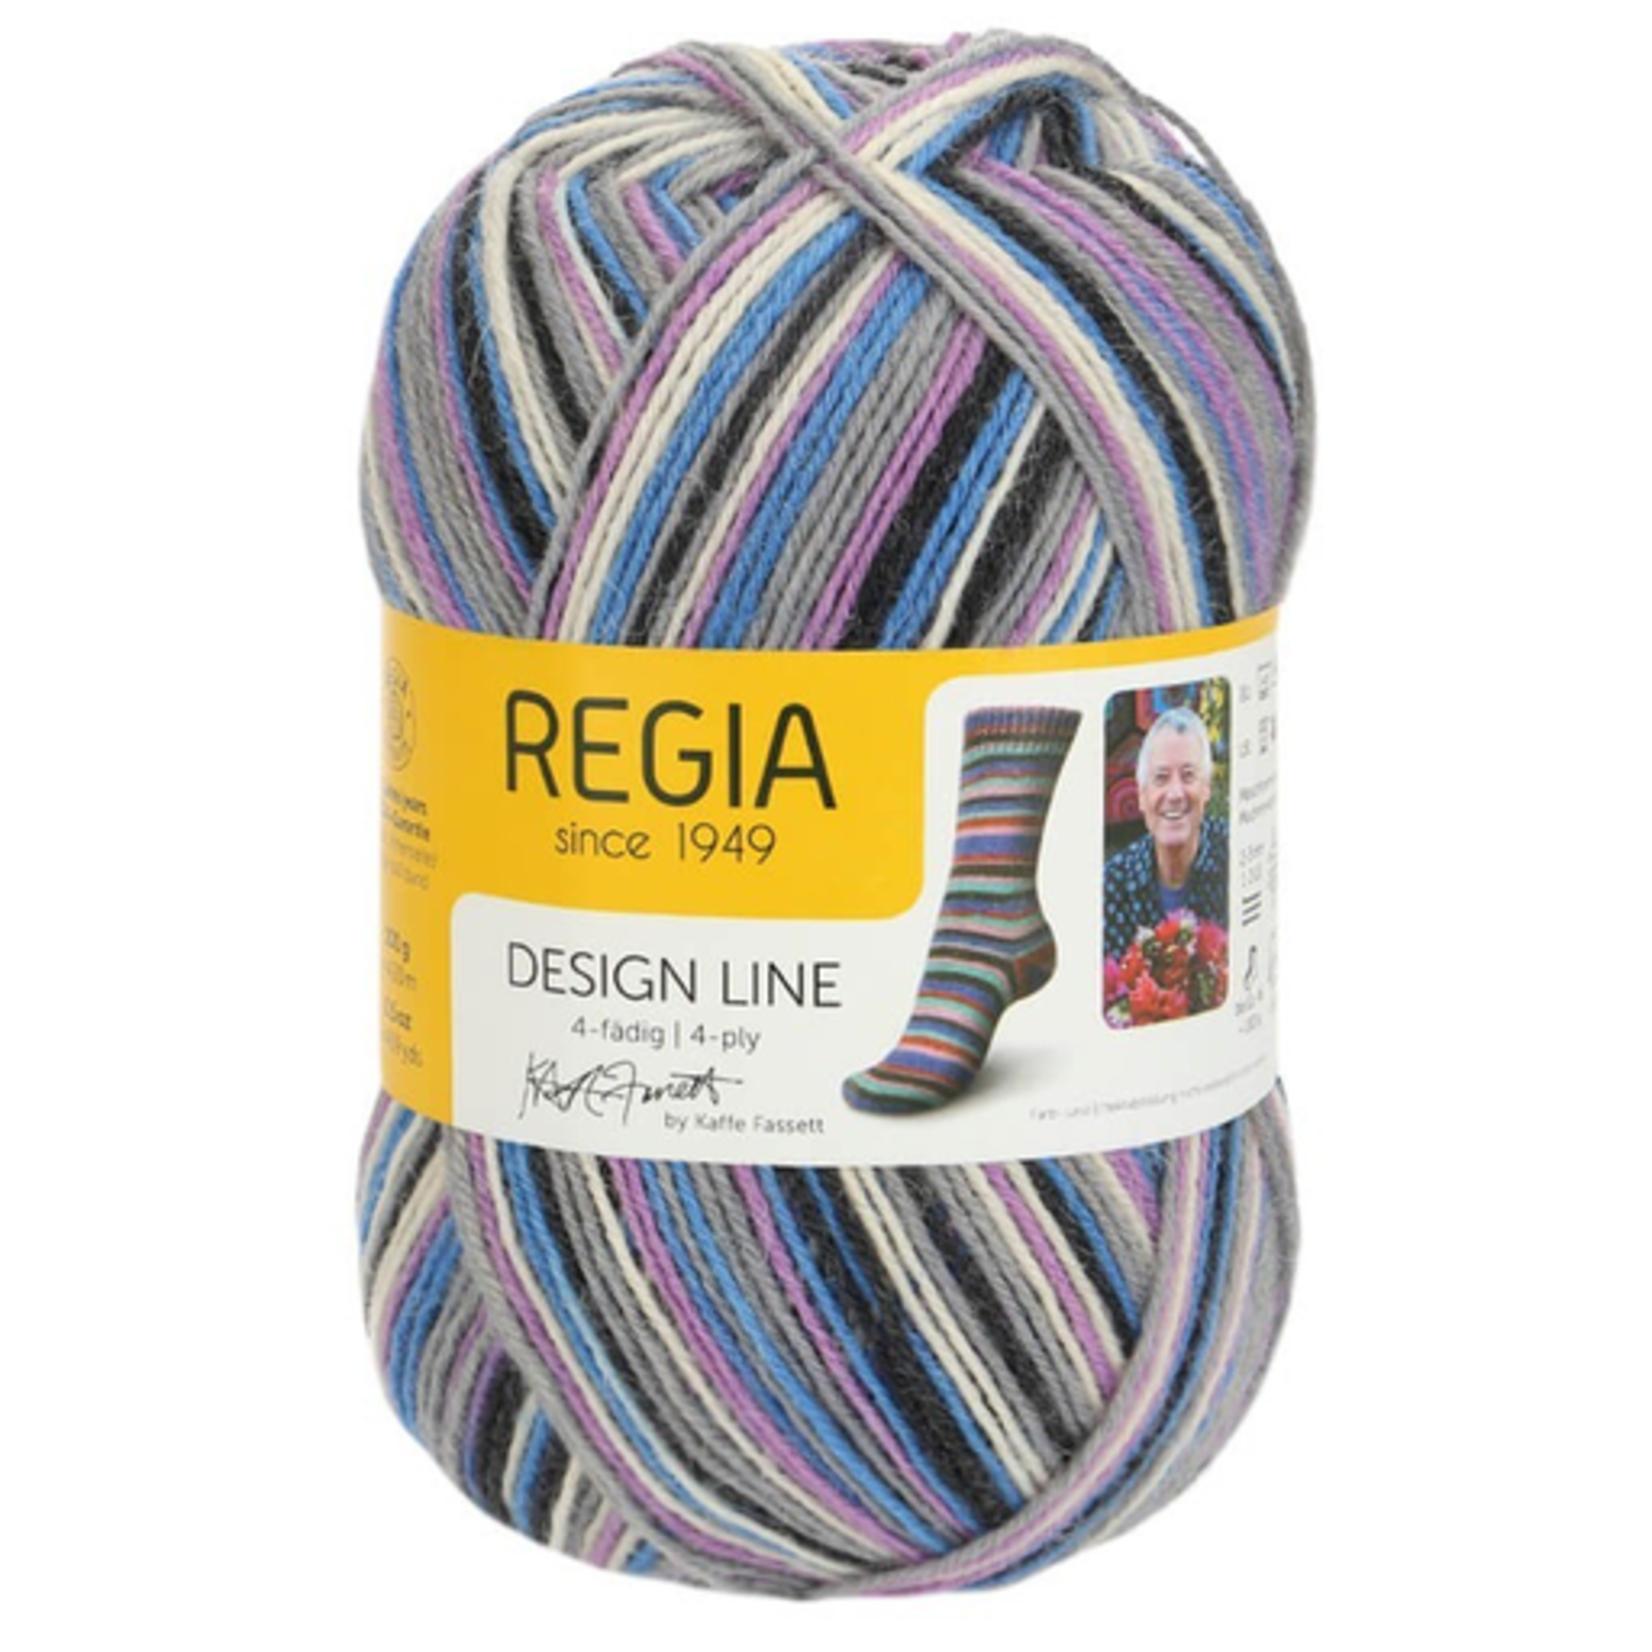 Regia 4 Ply Design Line KAFFE FASSETT by Regia